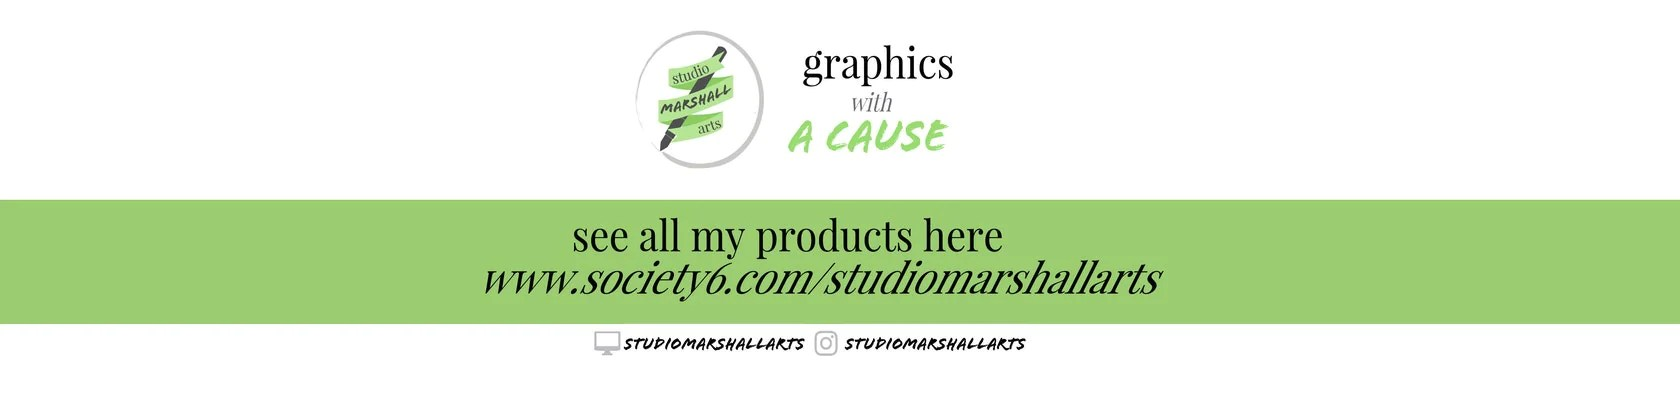 Studiomarshallarts by studiomarshallarts on Etsy - create a gift certificate template